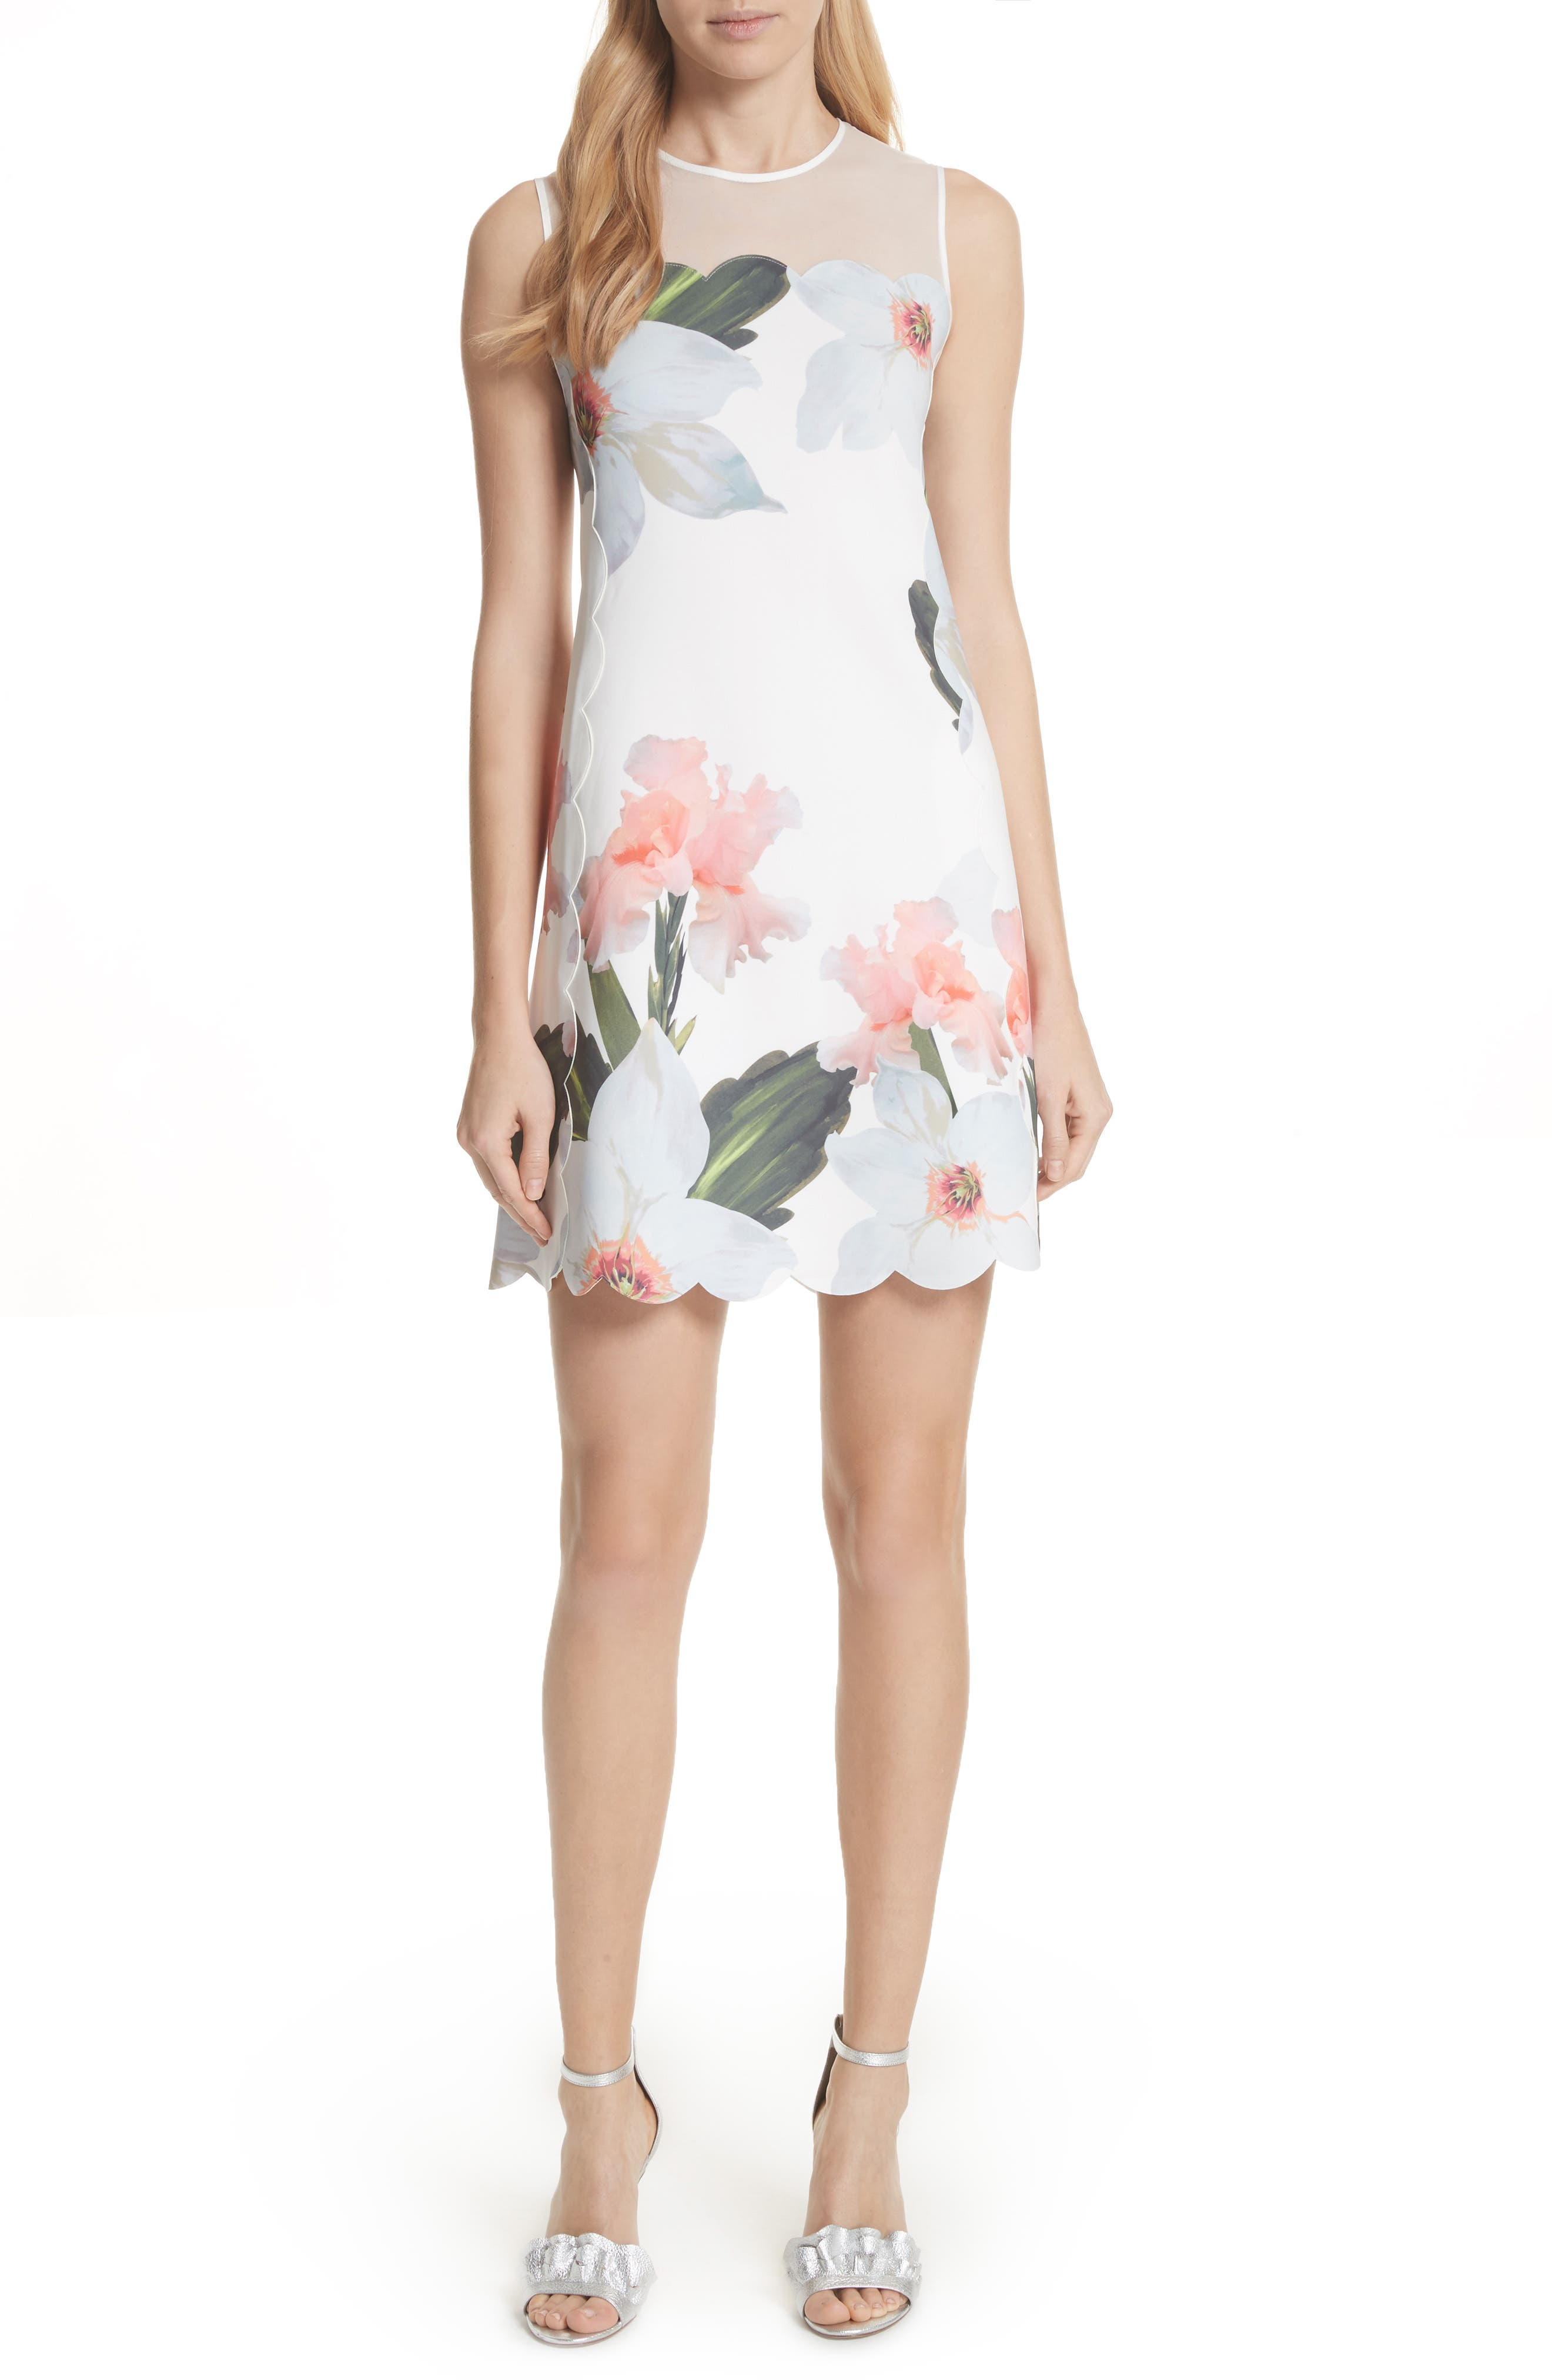 Chatsworth Bloom Tunic Dress,                             Main thumbnail 1, color,                             110